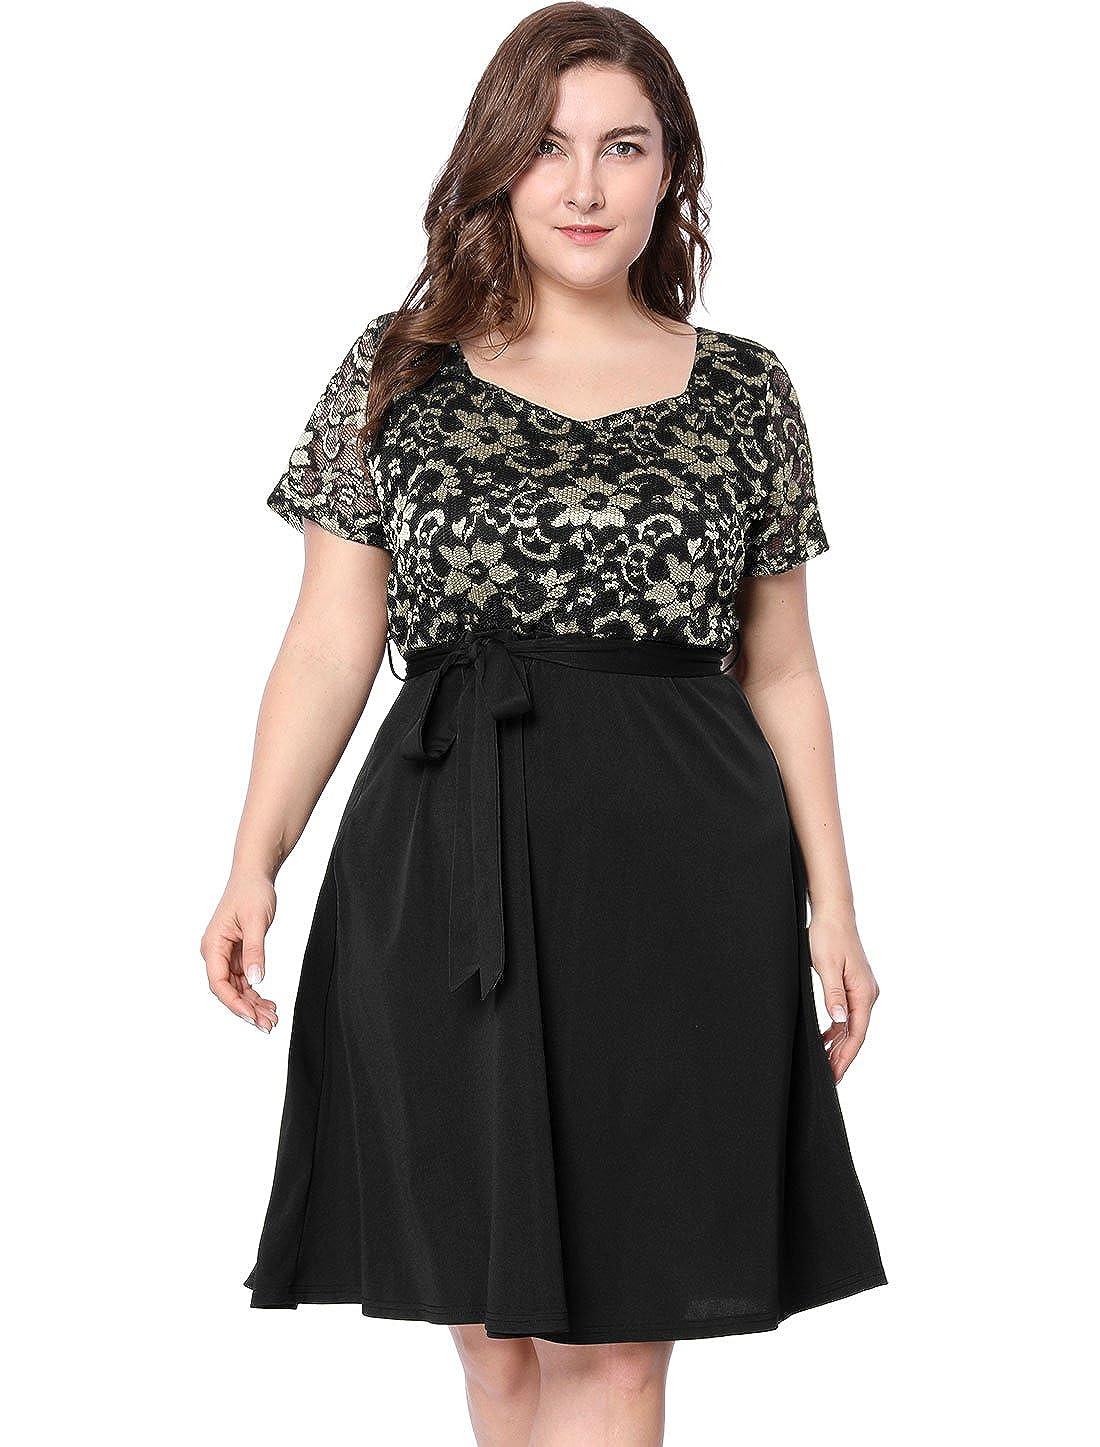 Agnes Orinda Women's Plus Size Square Neck Belted Floral Lace Panel Dress s18041300it0784